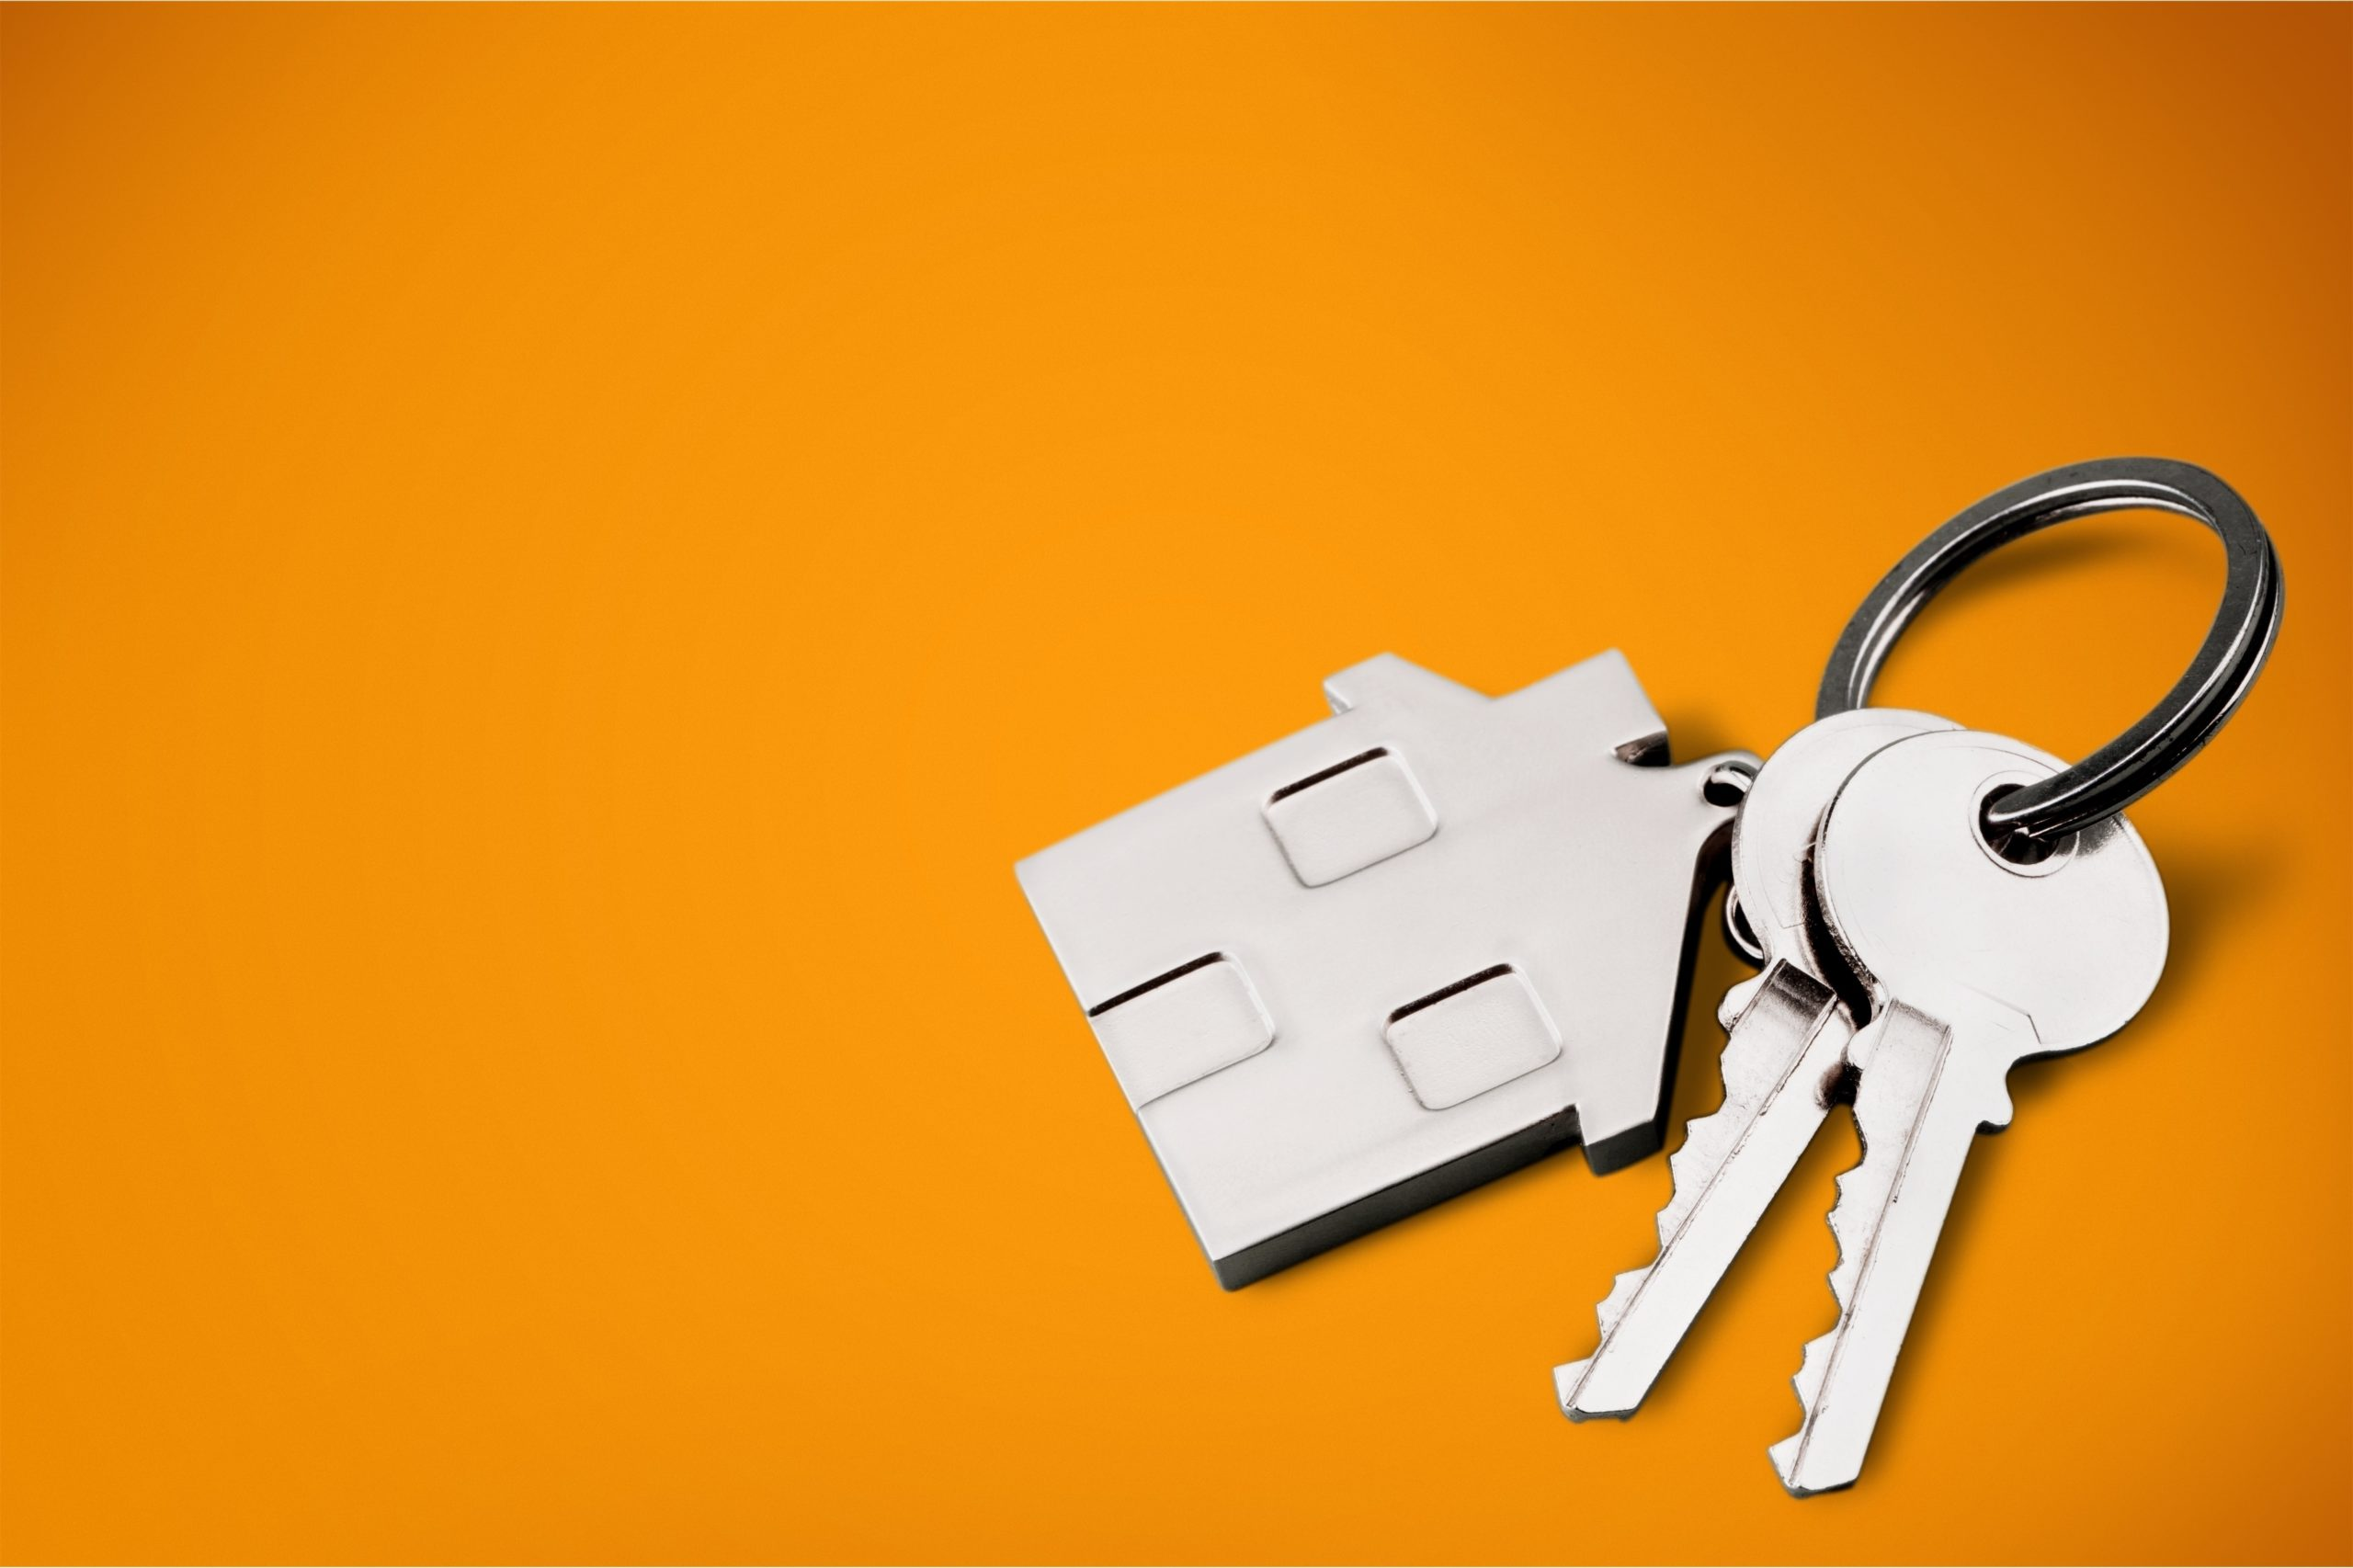 house shaped key chain and two keys on orange background